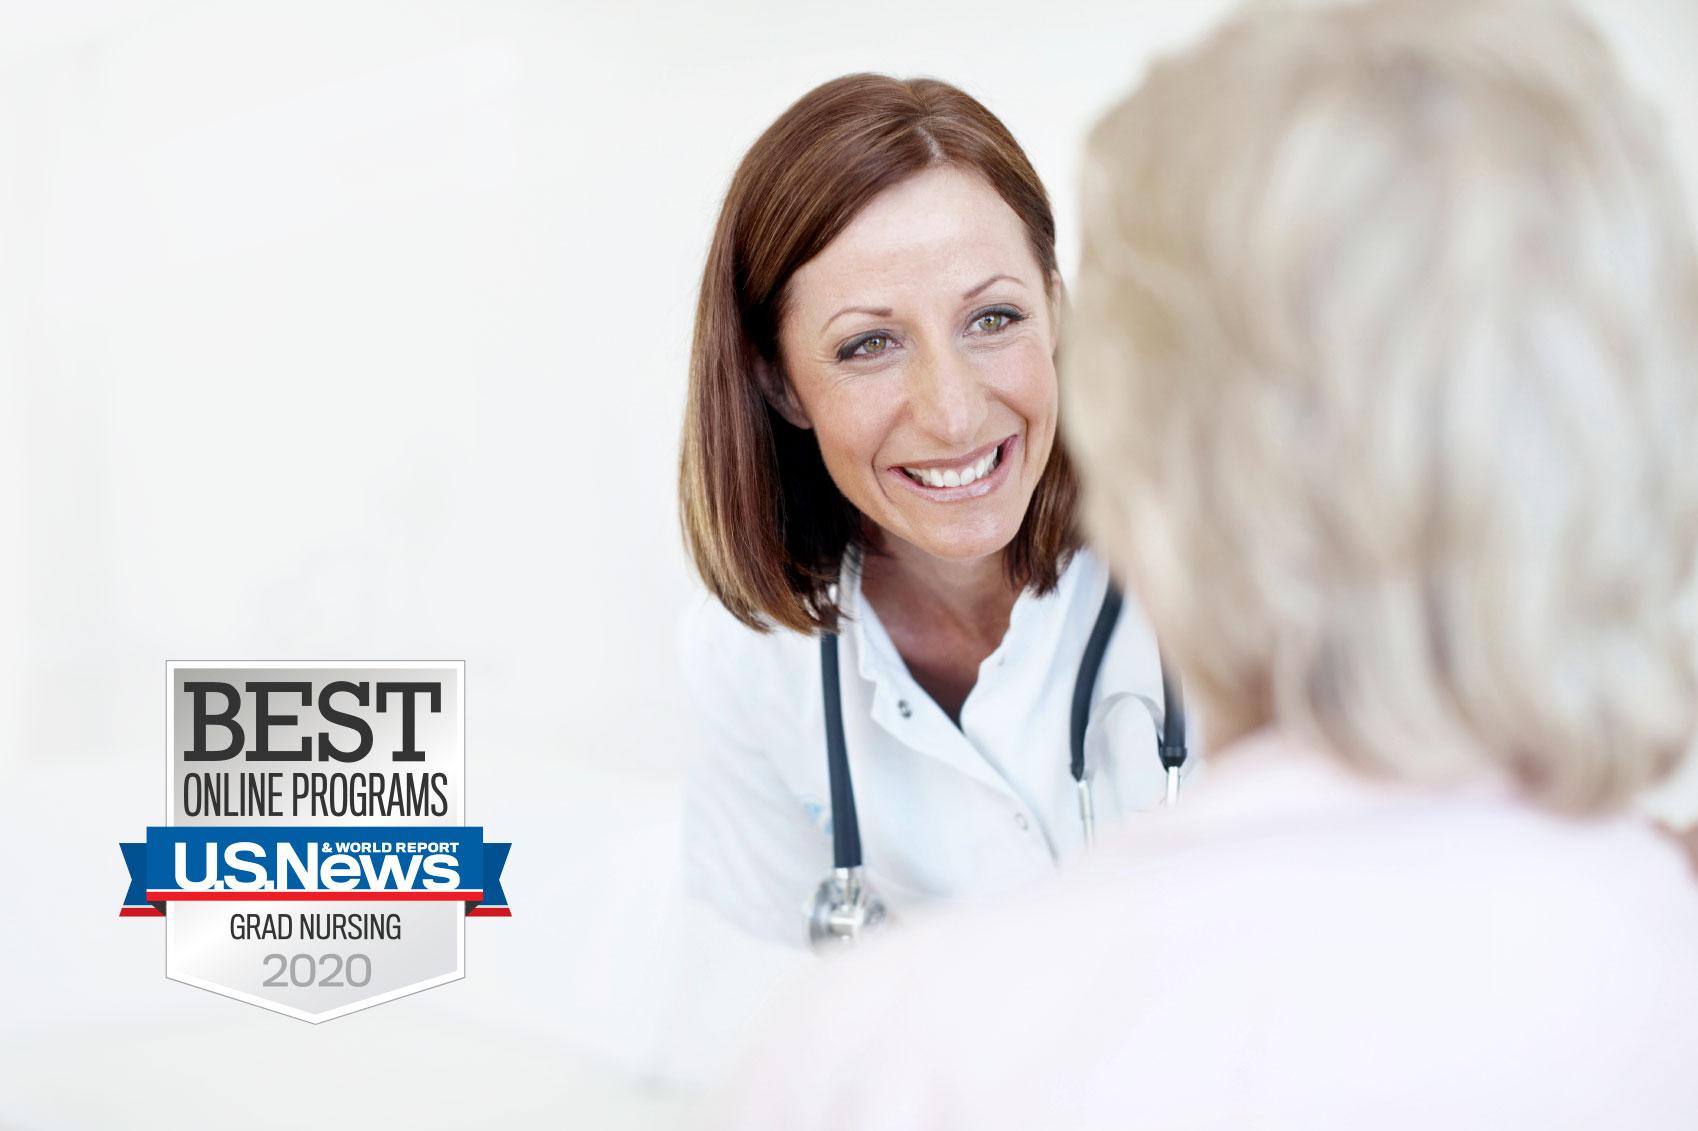 Graduate Nurse practicing in clinical setting